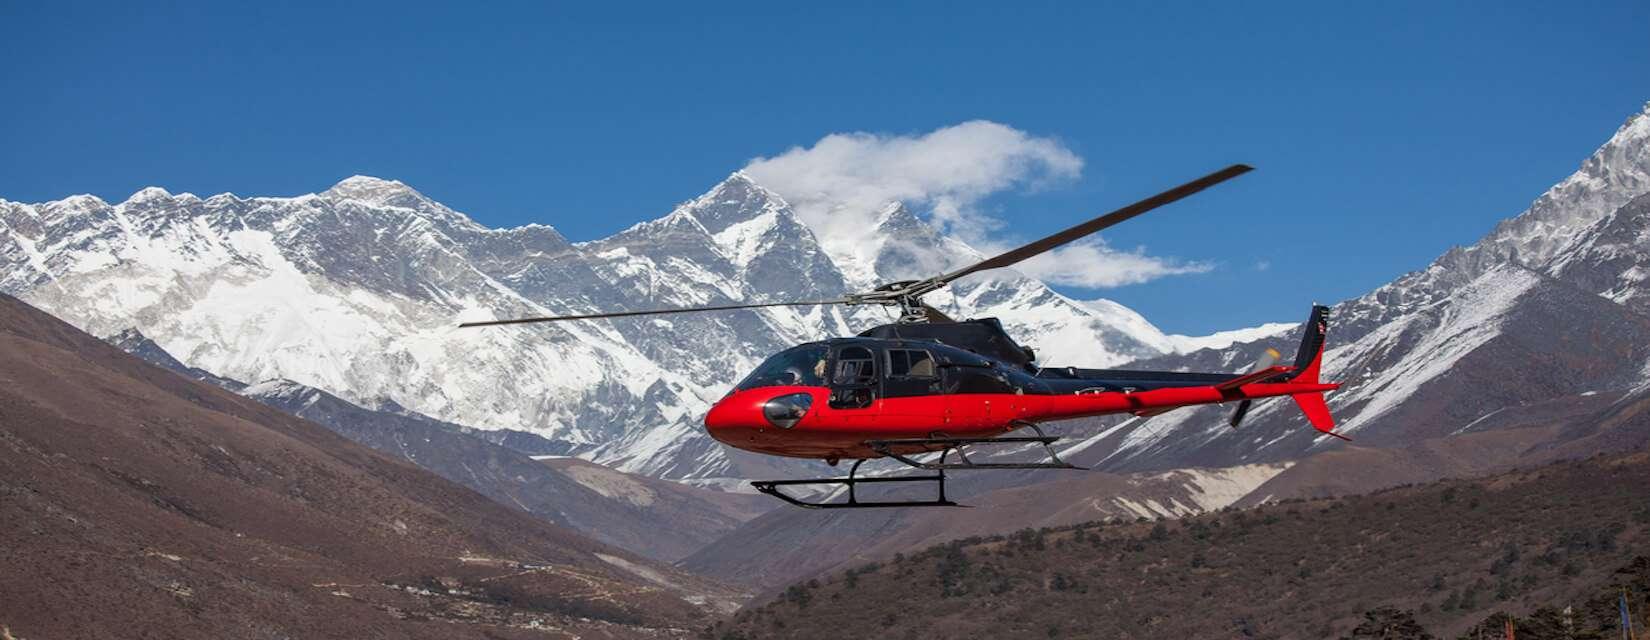 How to Choose a Trek in Nepal